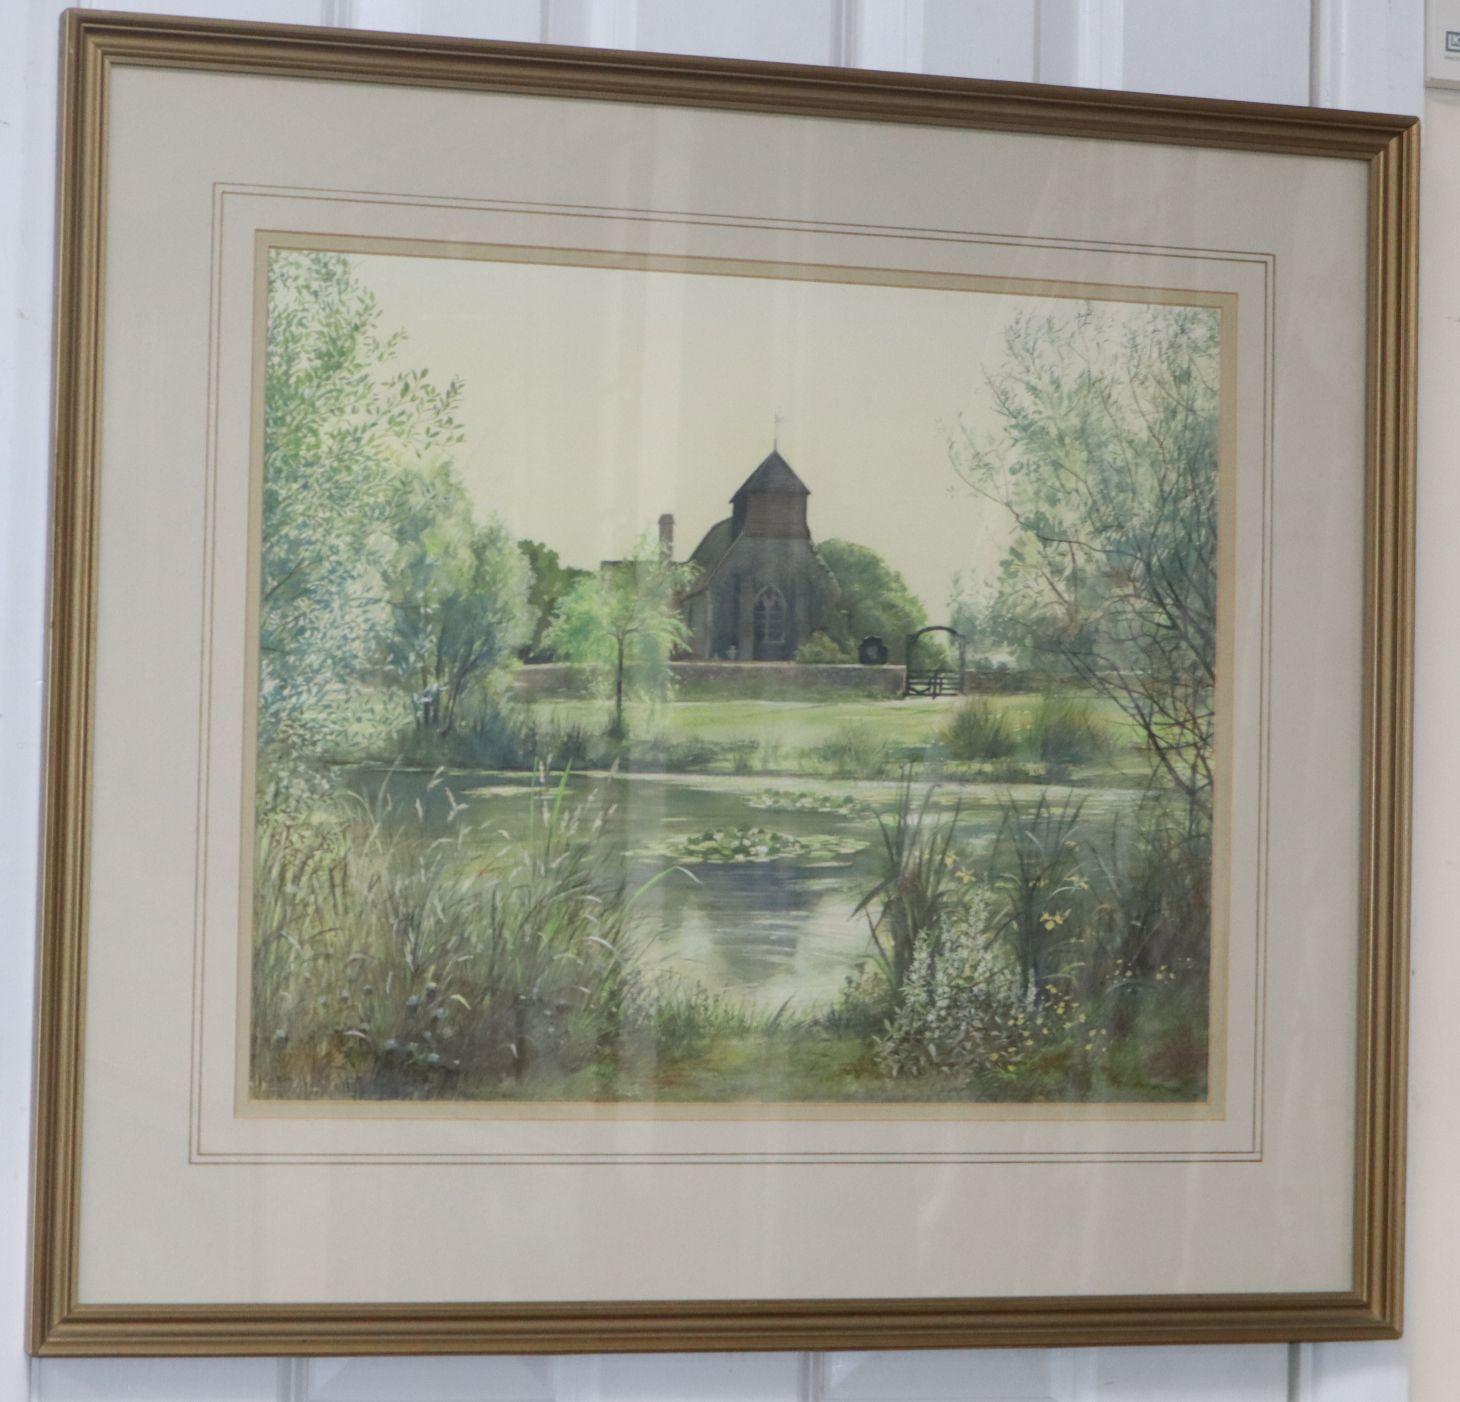 Lot 475 - Susan Jackman, watercolour, Friston Church, signed, 37 x 46cm.